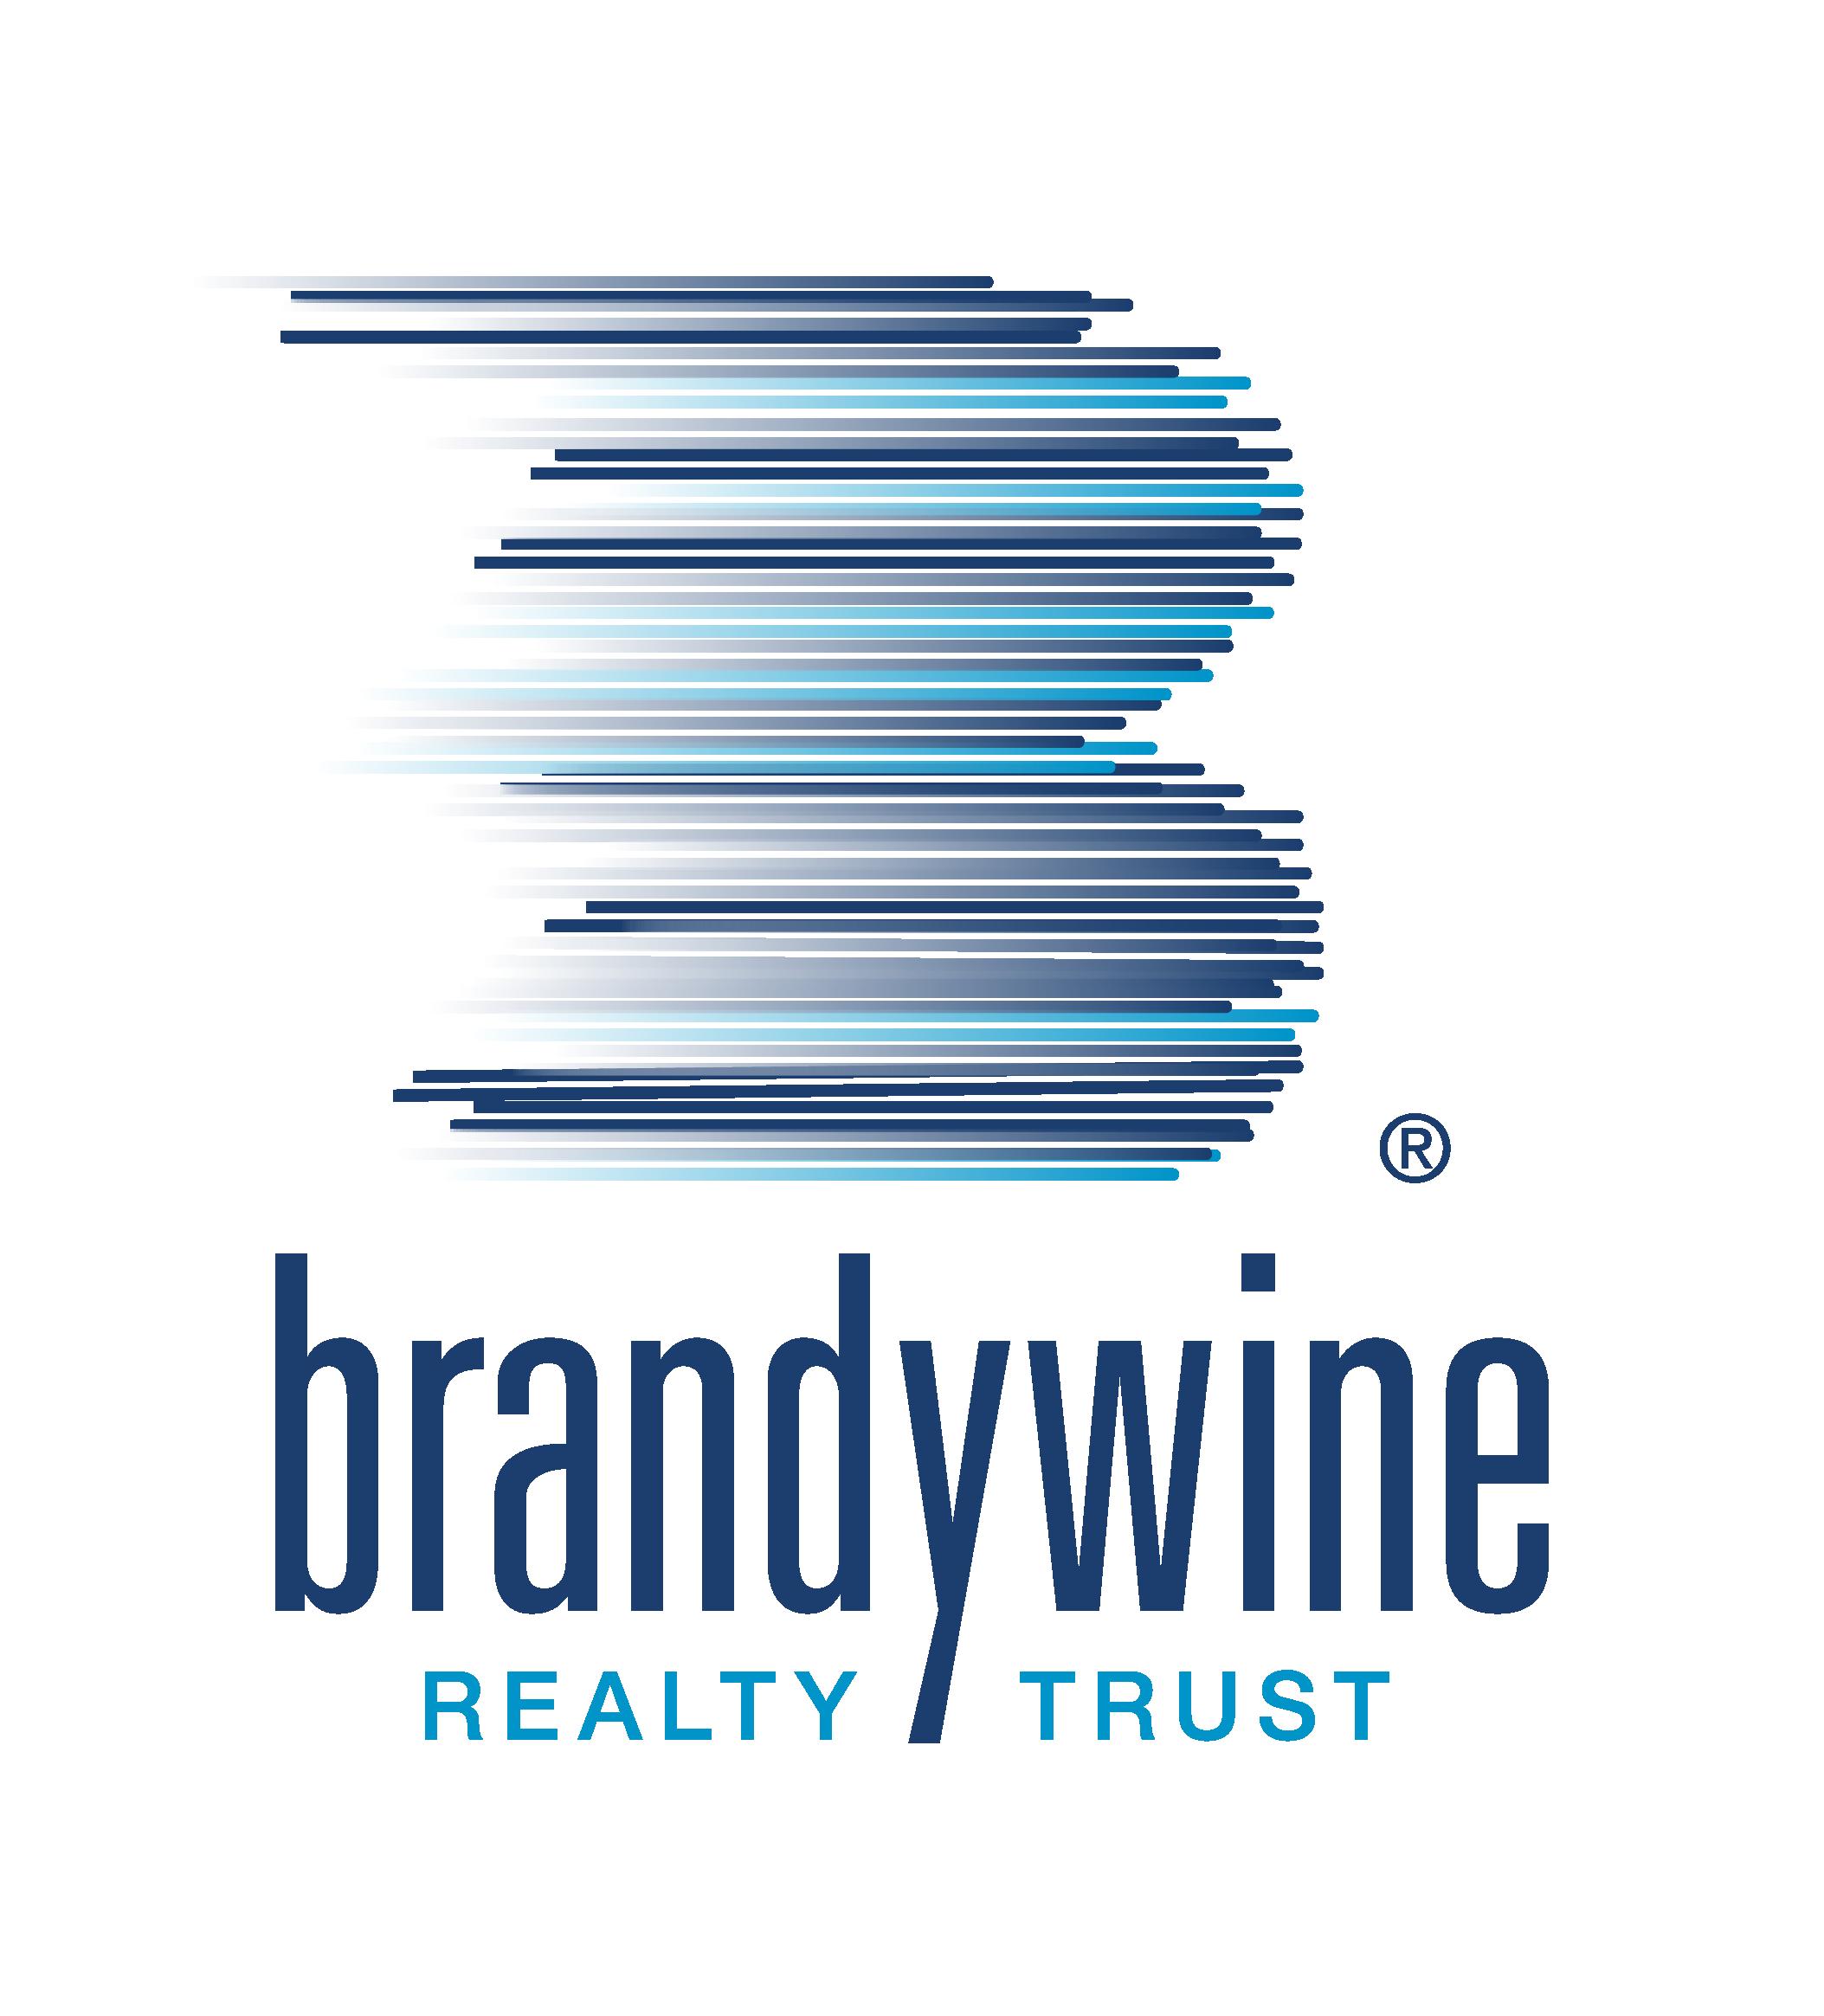 Brandywine Realty Trust - Wikipedia